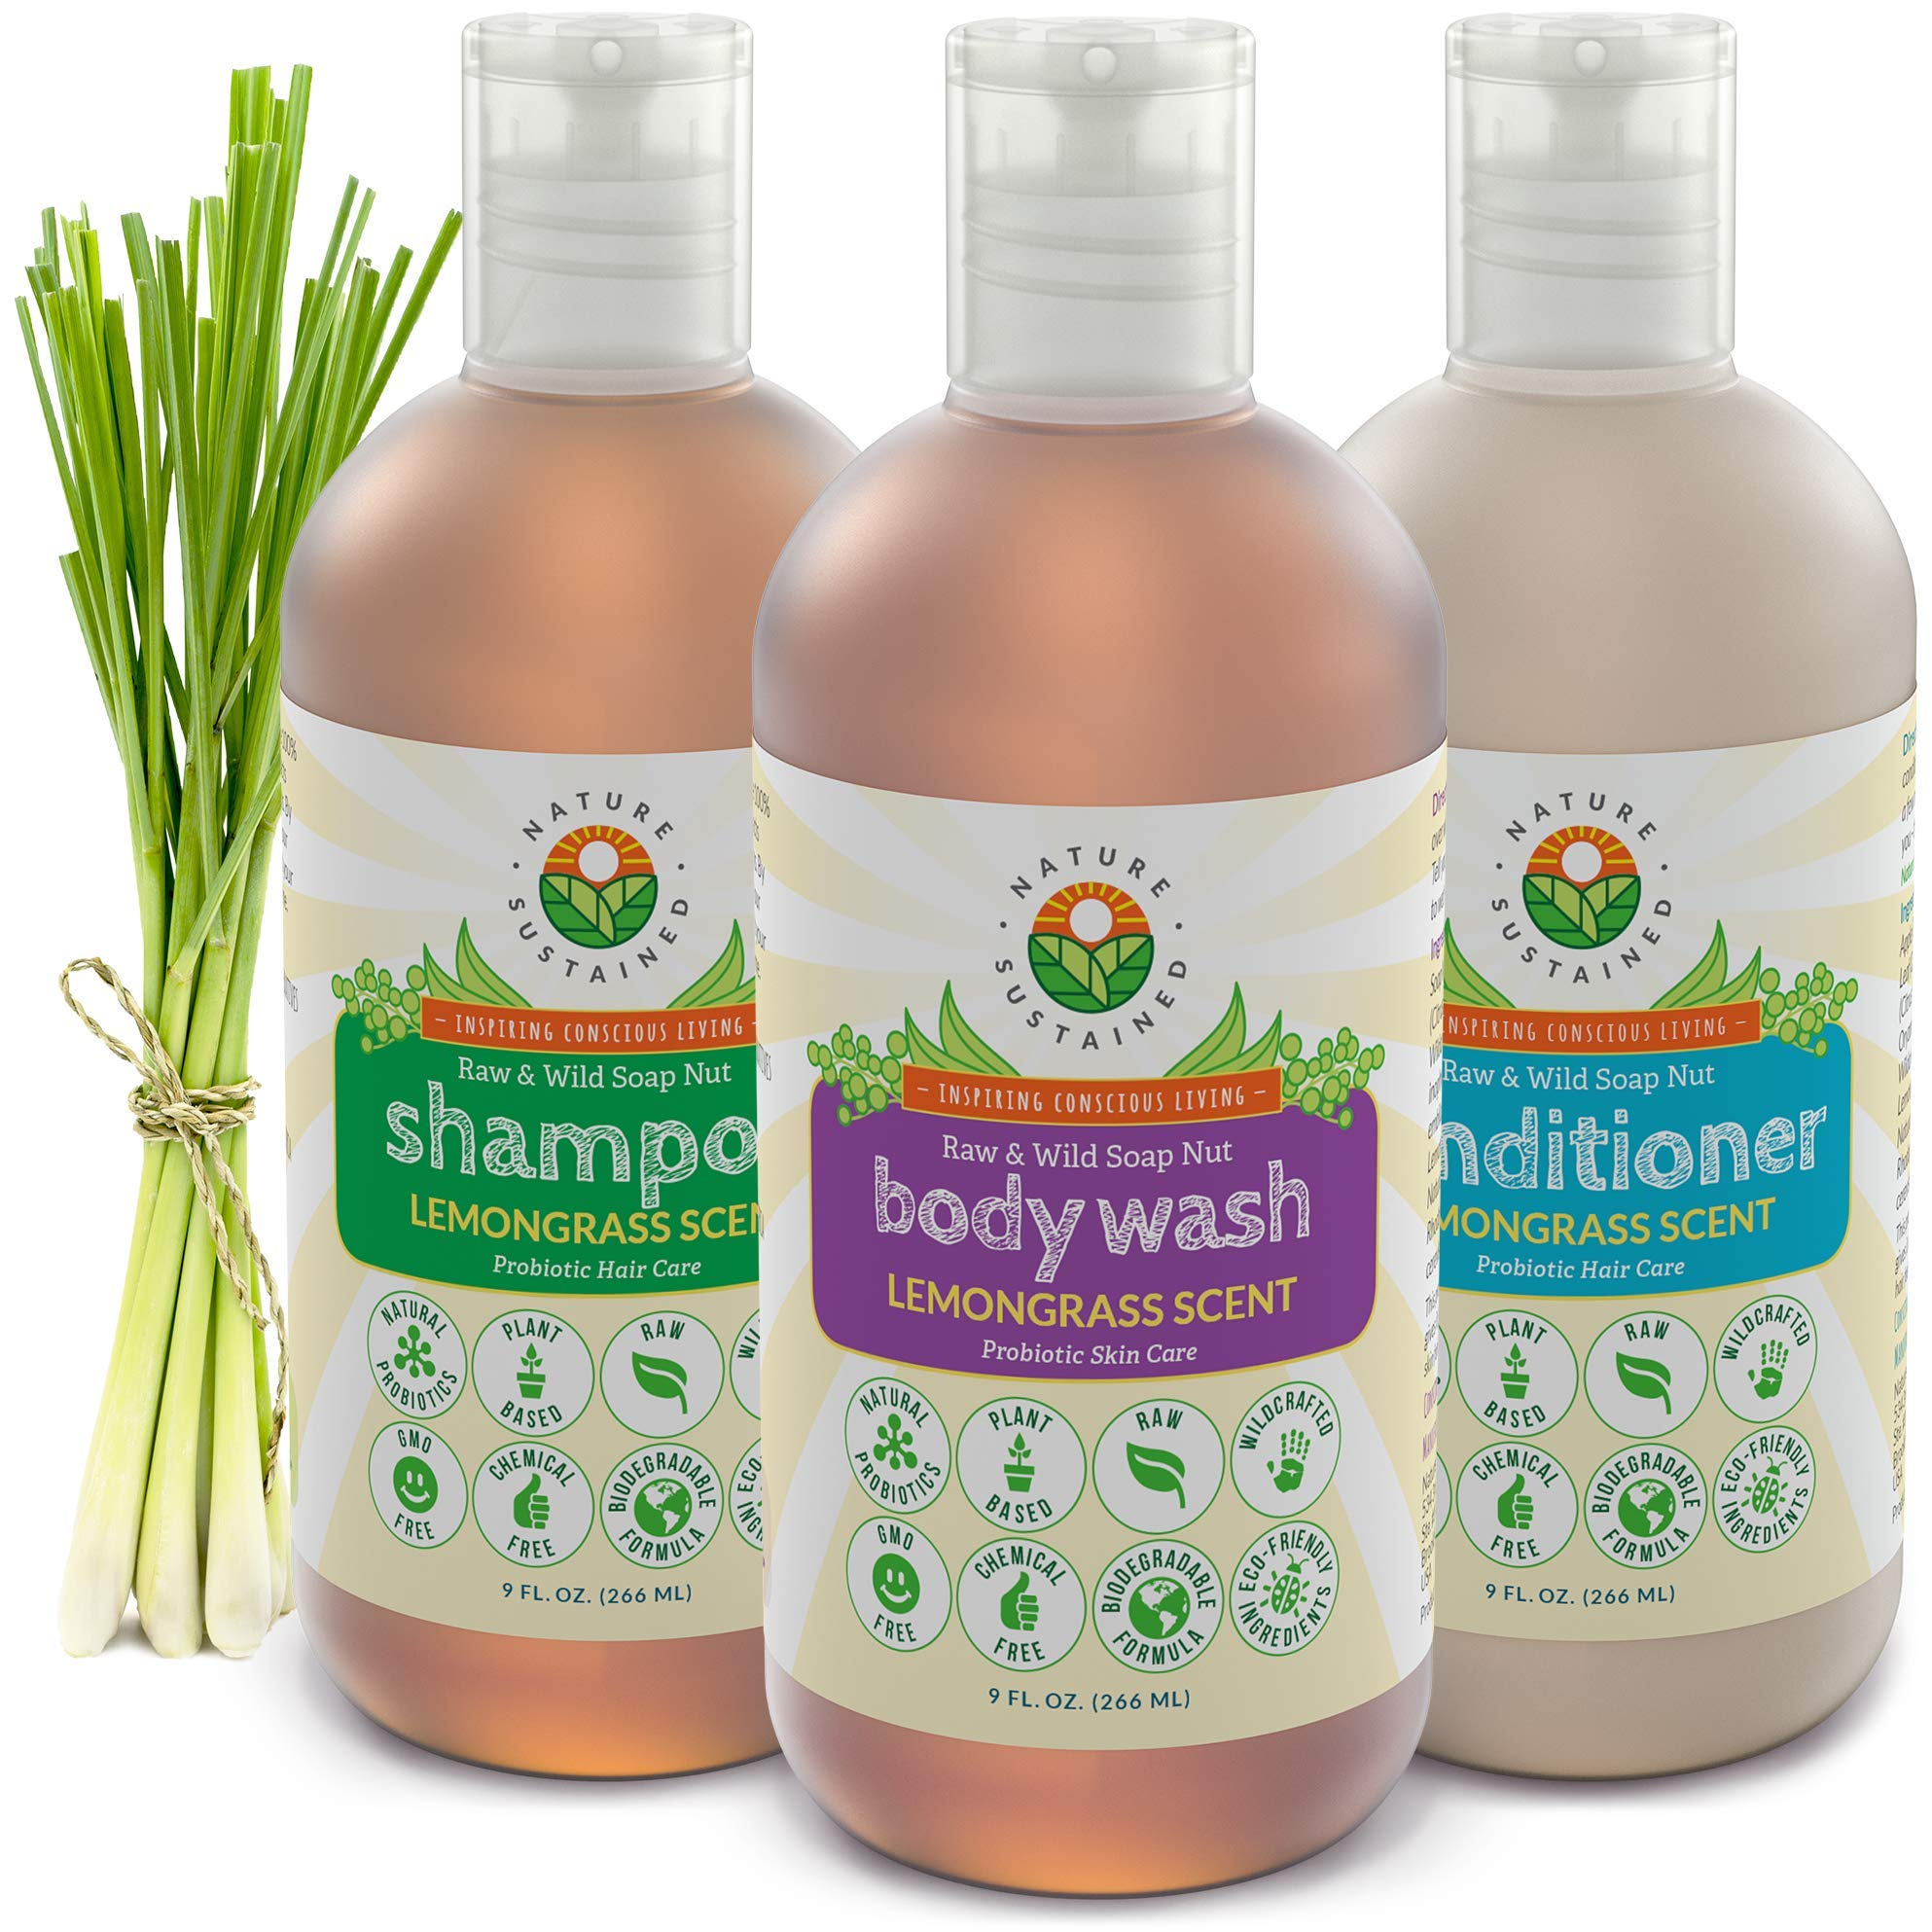 Probiotic Sensitive Skin Shampoo, Body Wash & Conditioner [Lemongrass] (3 Pack Gift Bundle) Raw Probiotic Soapberry Formula (pH Balanced) for Sensitive Skin & Dry Hair - (9 Oz. Bottles)